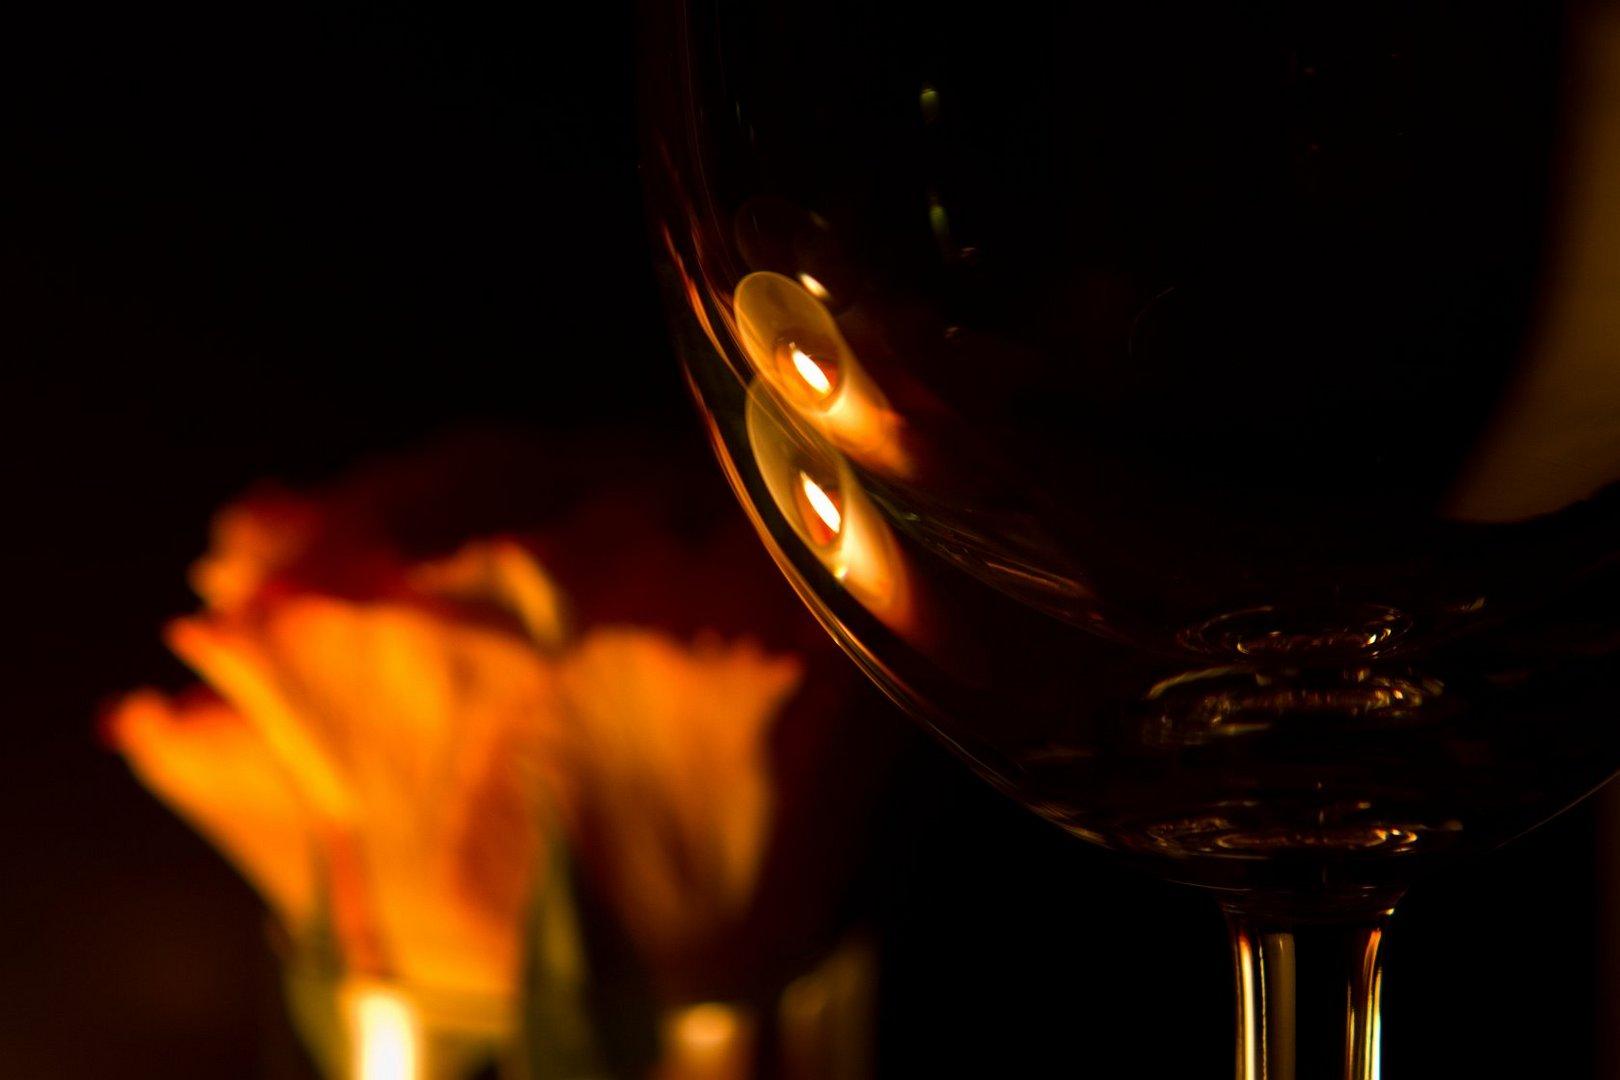 A good glas of wine - it's mine